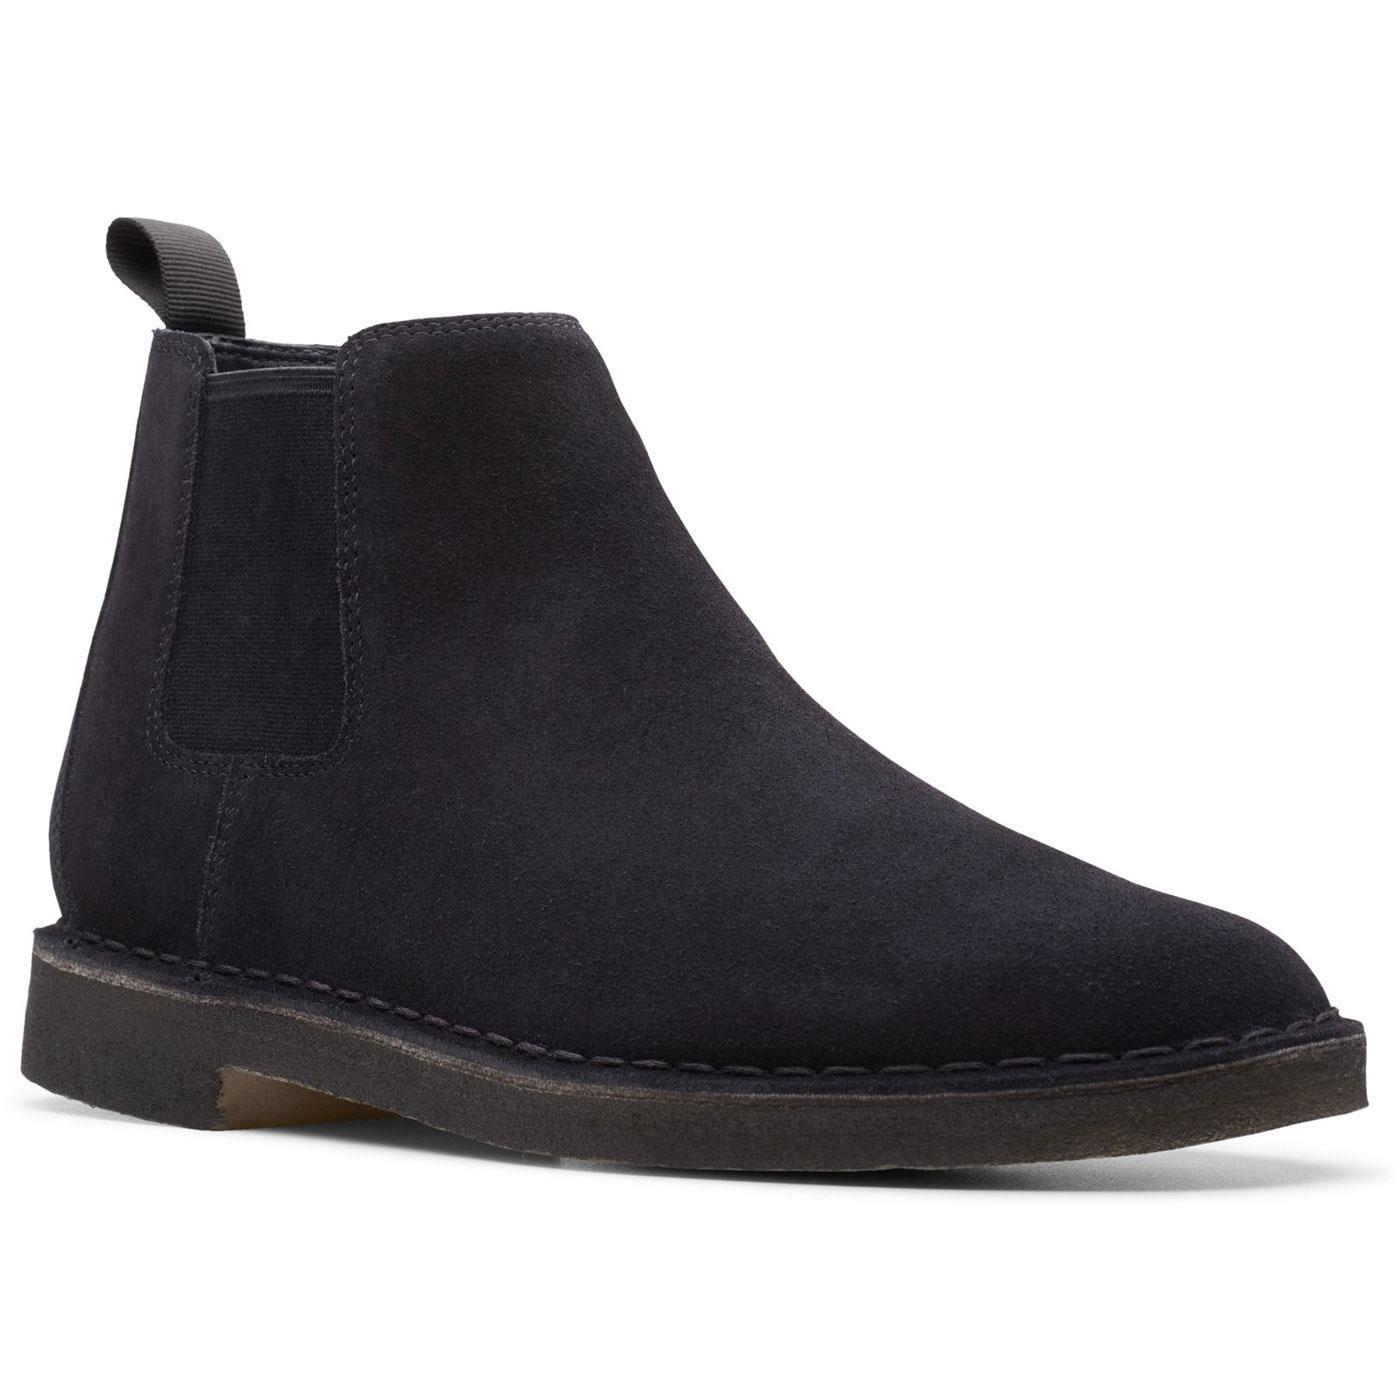 Desert Chelsea Boots CLARKS ORIGINALS Suede Shoes